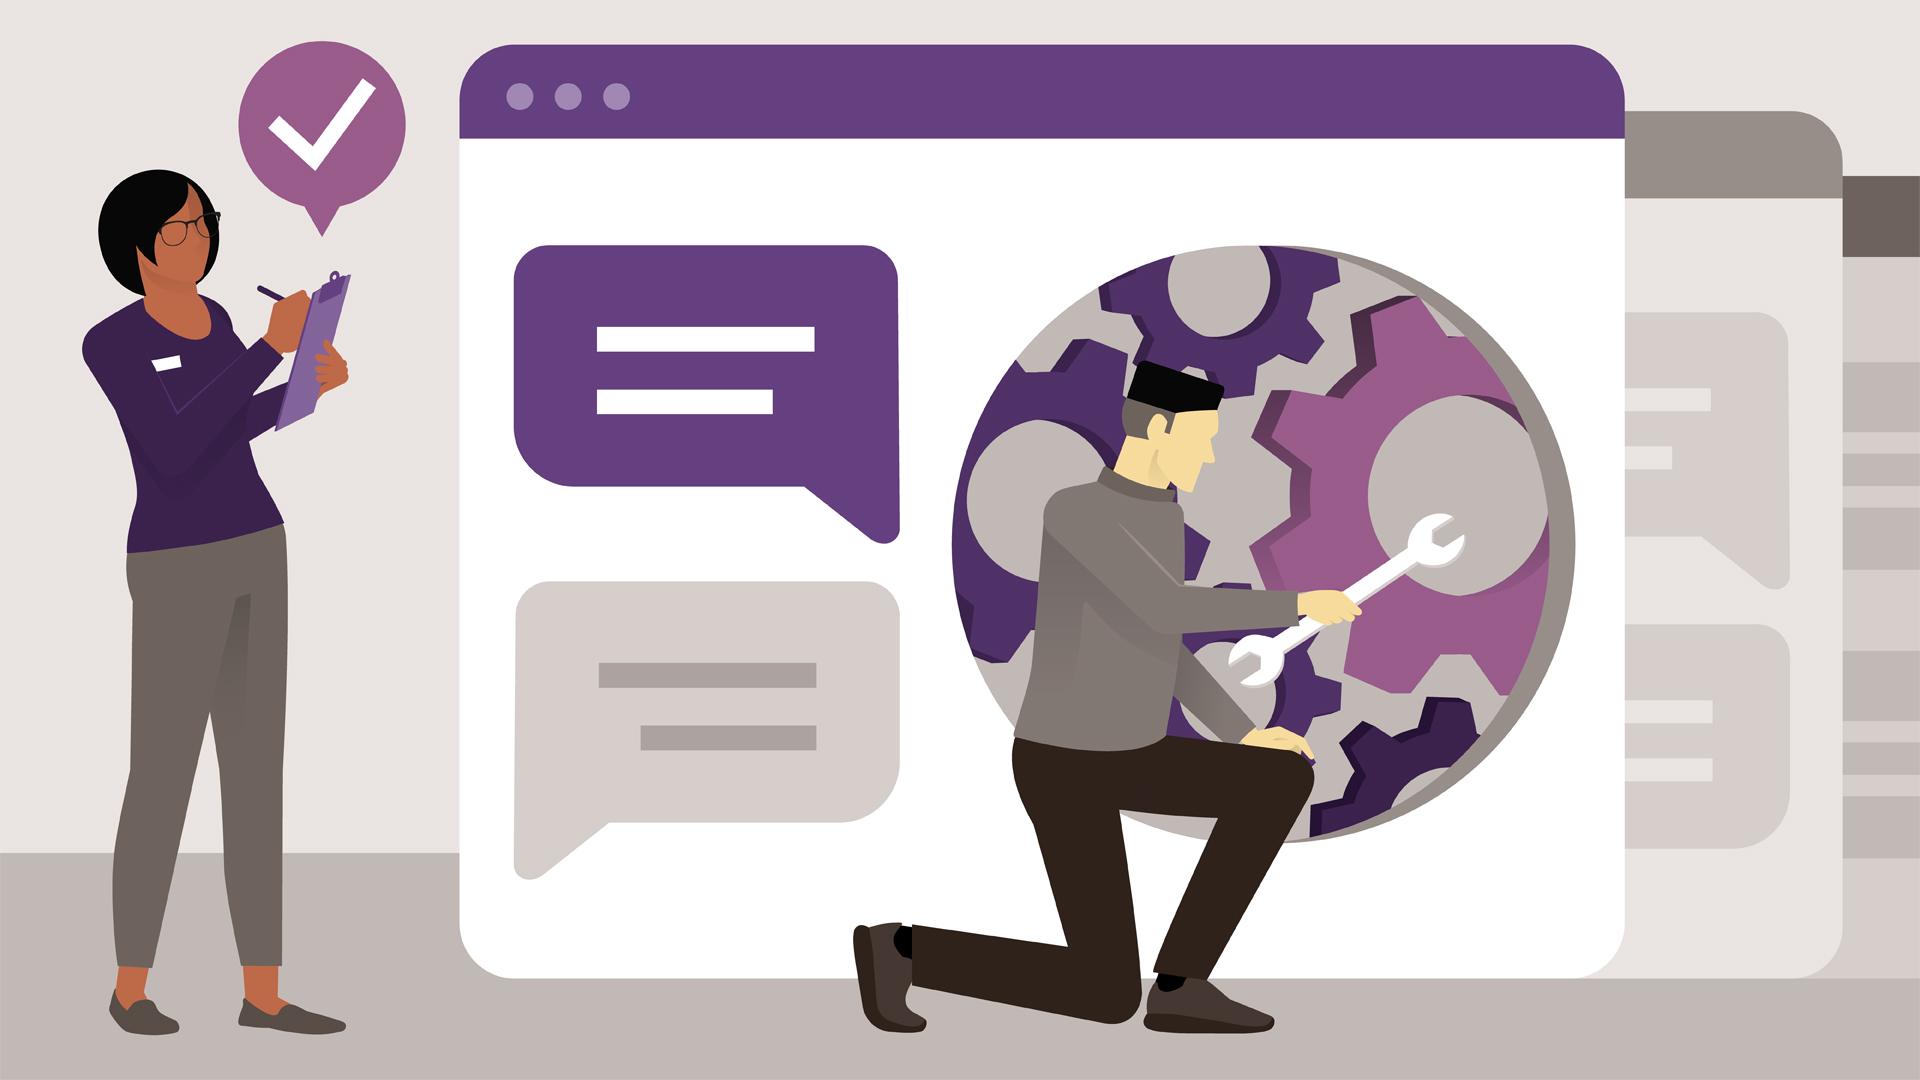 Plan and configure your Microsoft messaging platform: Planning and Configuring a Microsoft Messaging Platform